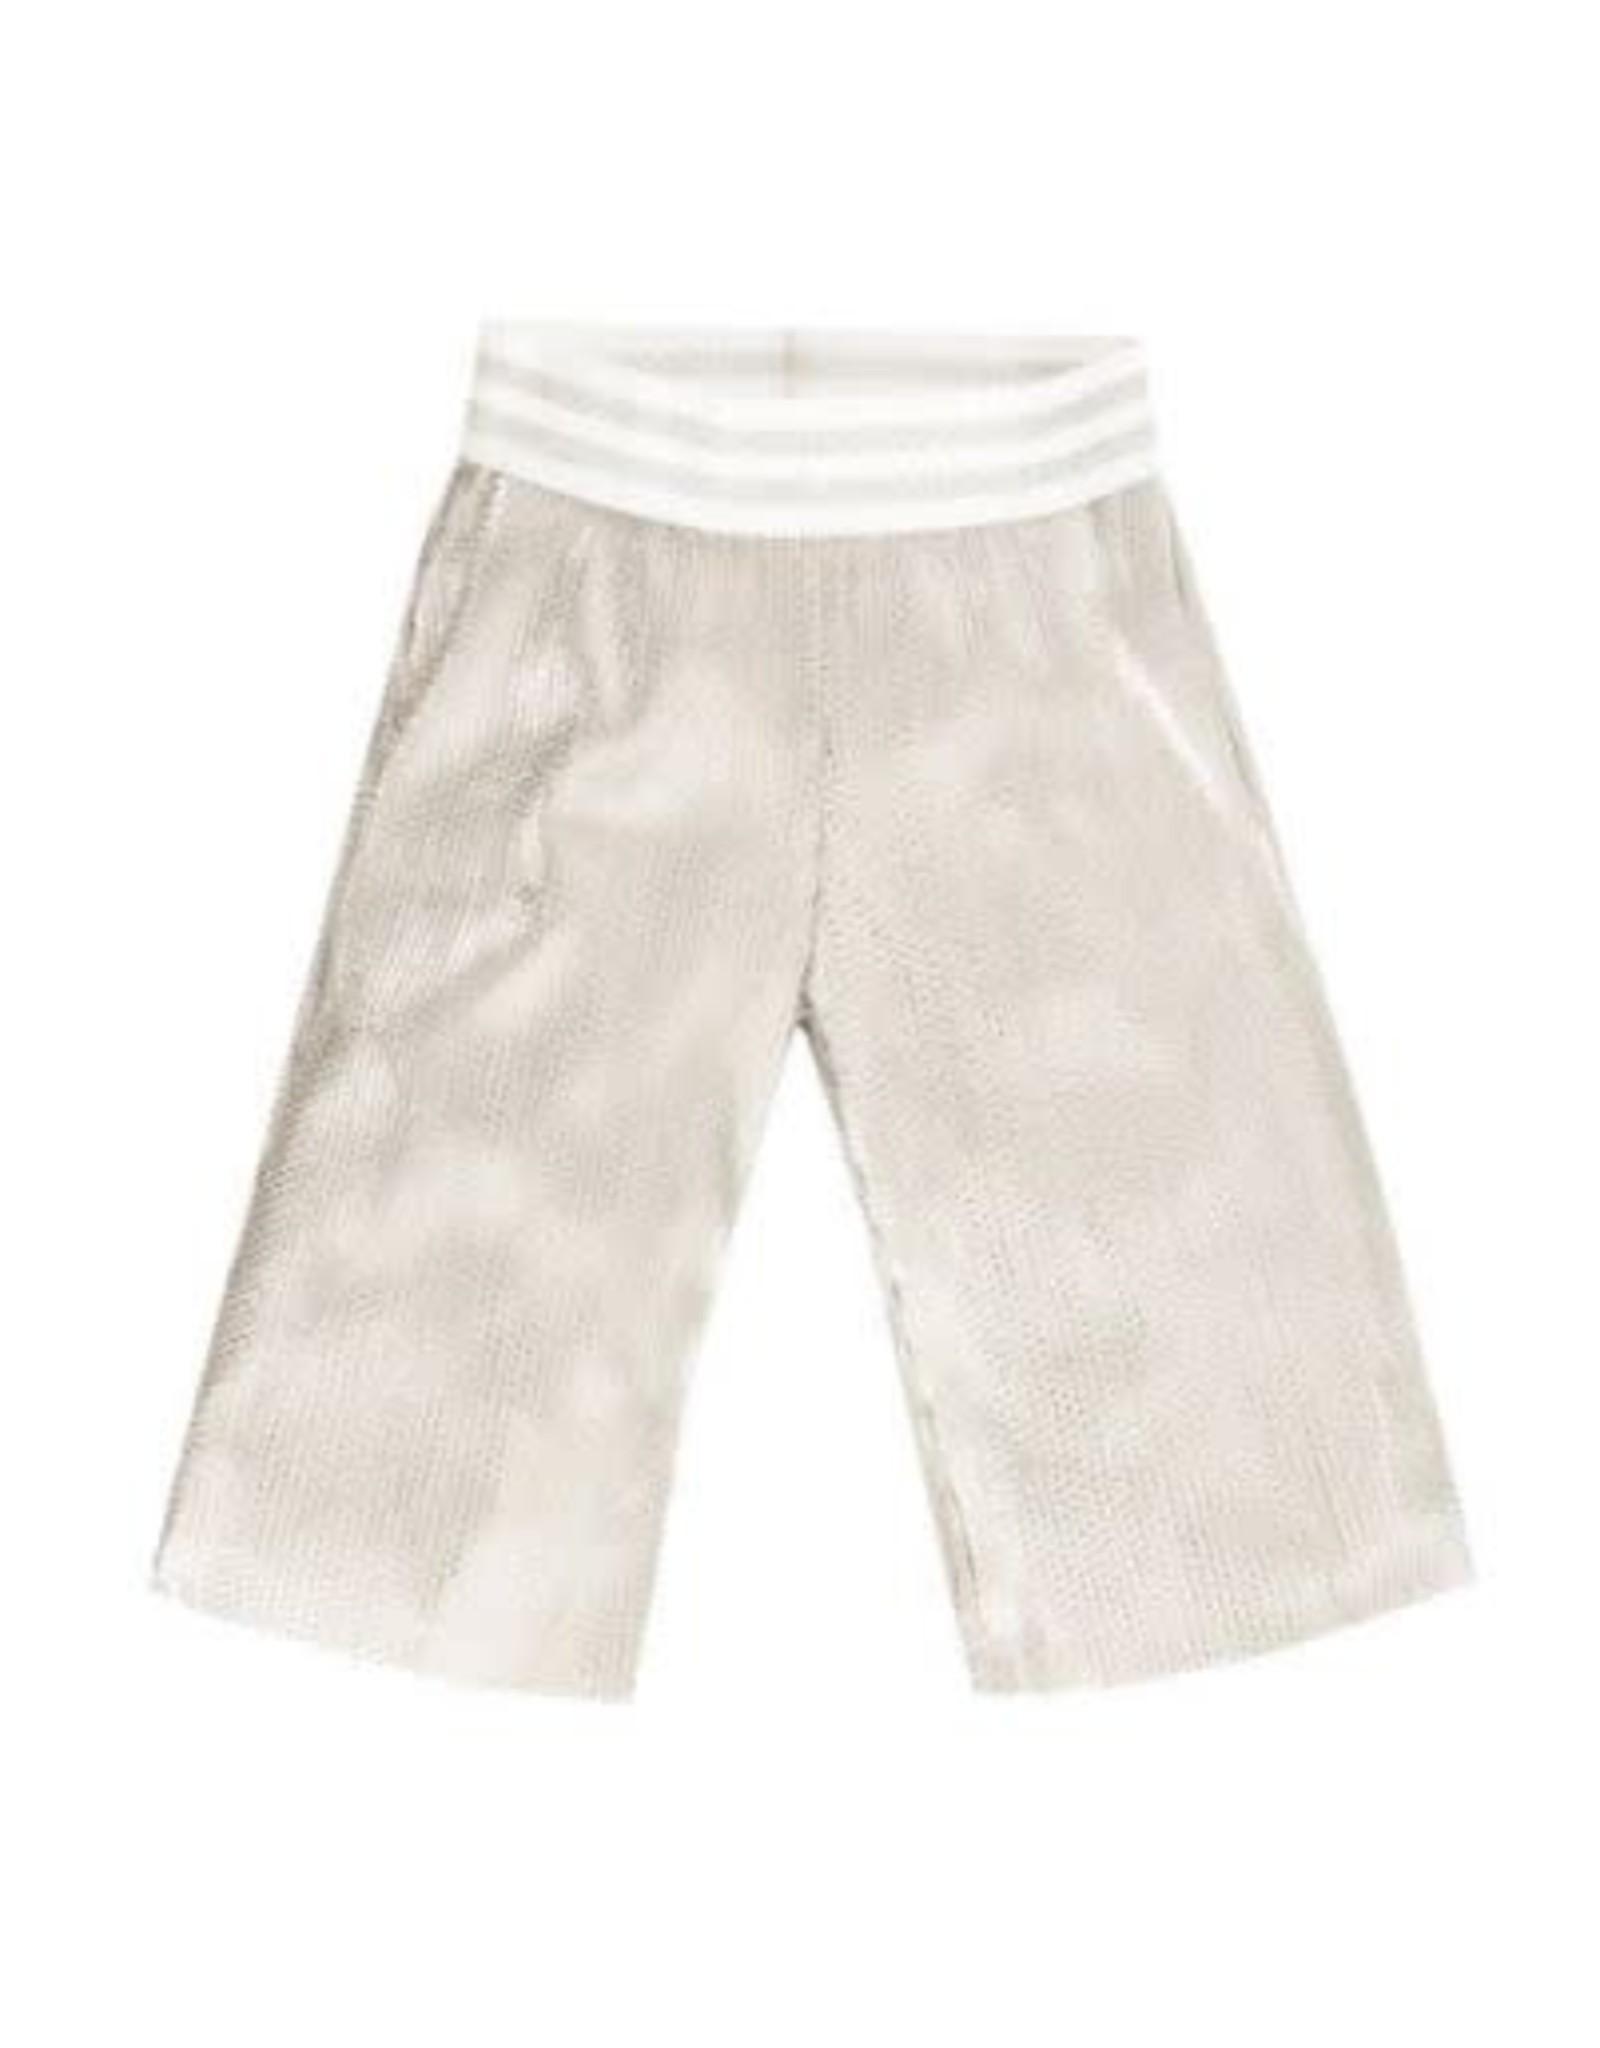 EMC Metallized Plisse Trousers